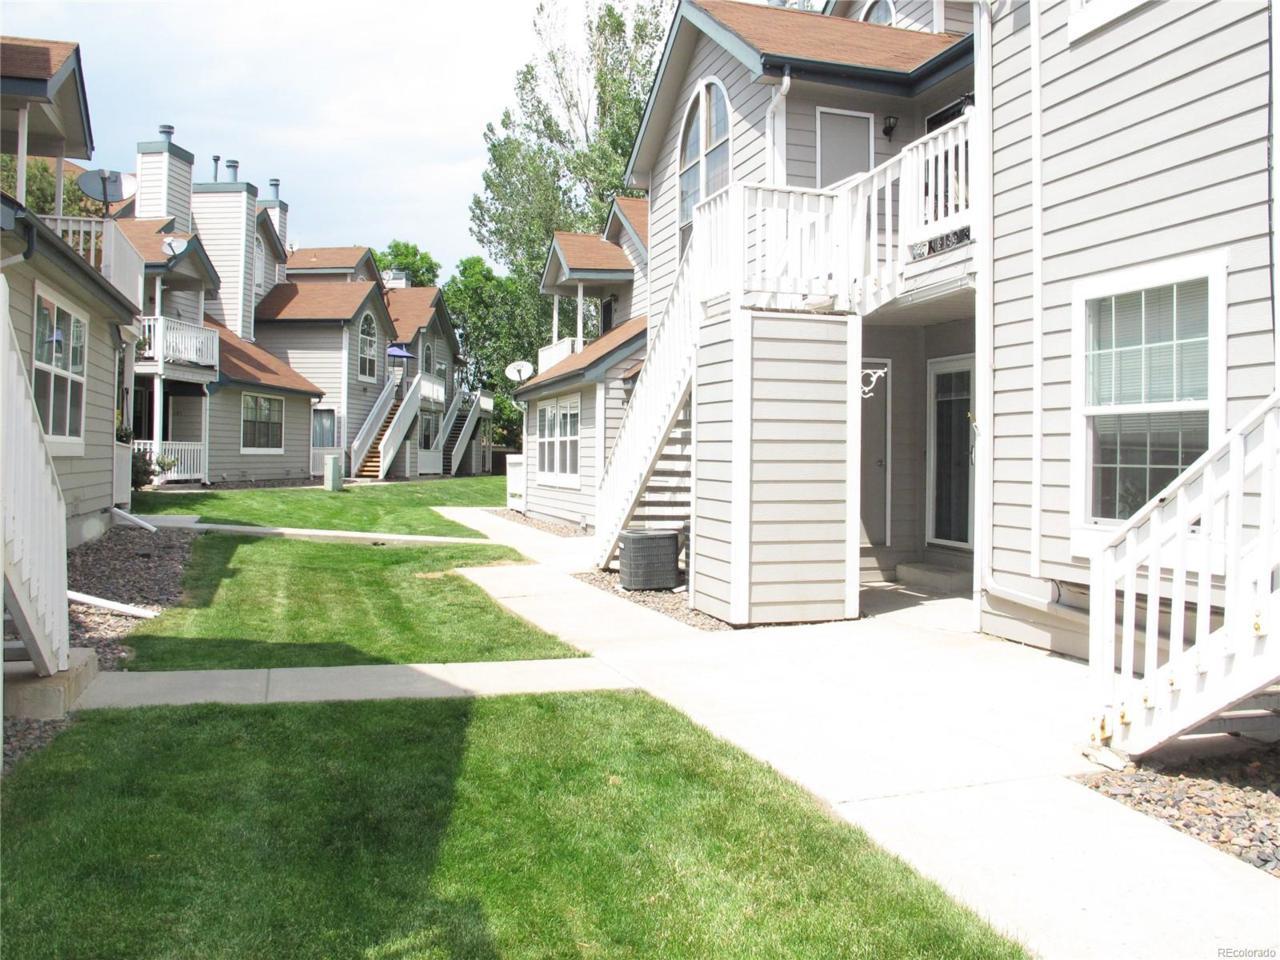 8327 S Upham Way 3-102, Littleton, CO 80128 (MLS #5883415) :: 8z Real Estate